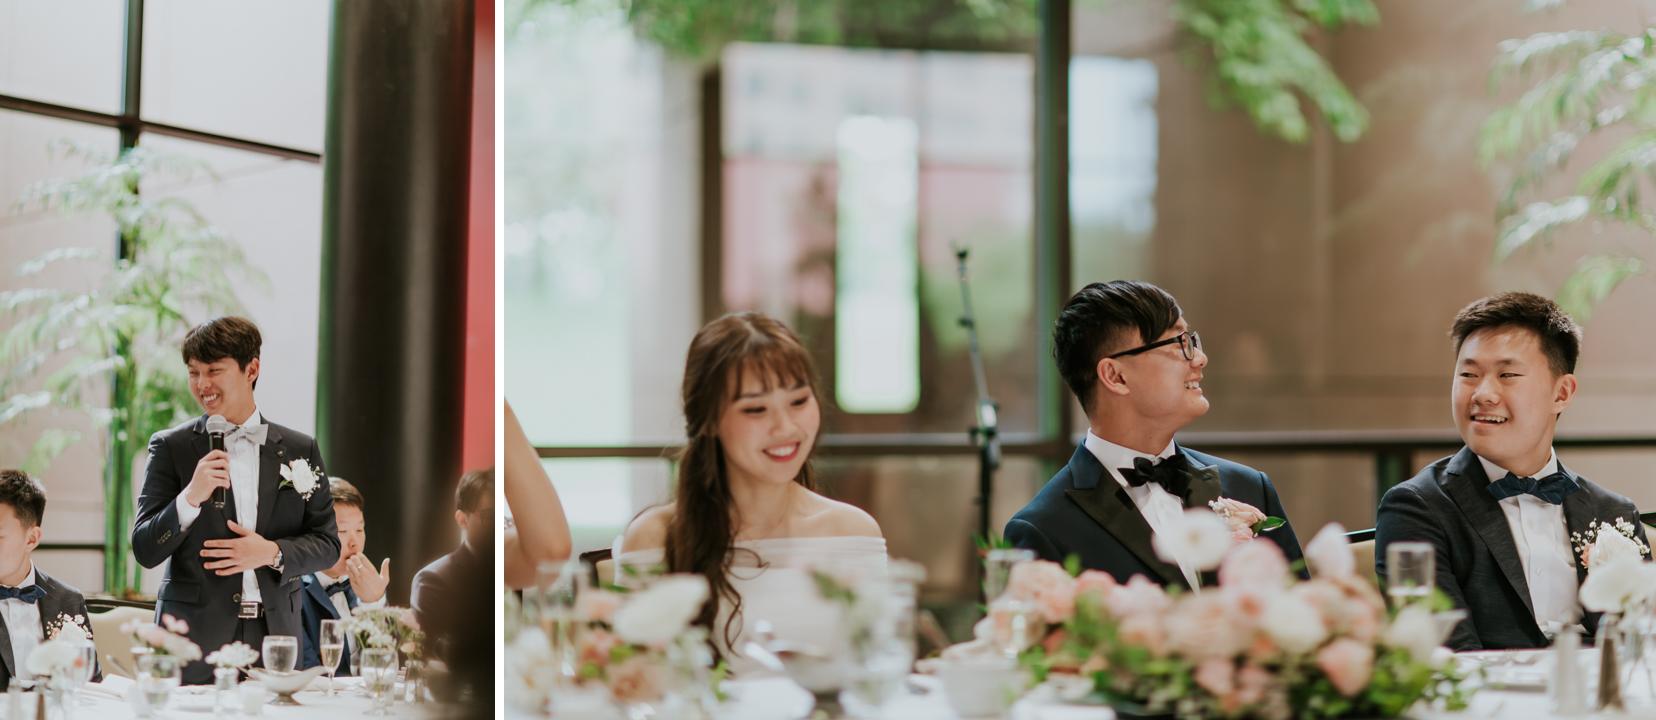 LGP-ann-arbor-eagle-crest-wedding-059.jpg